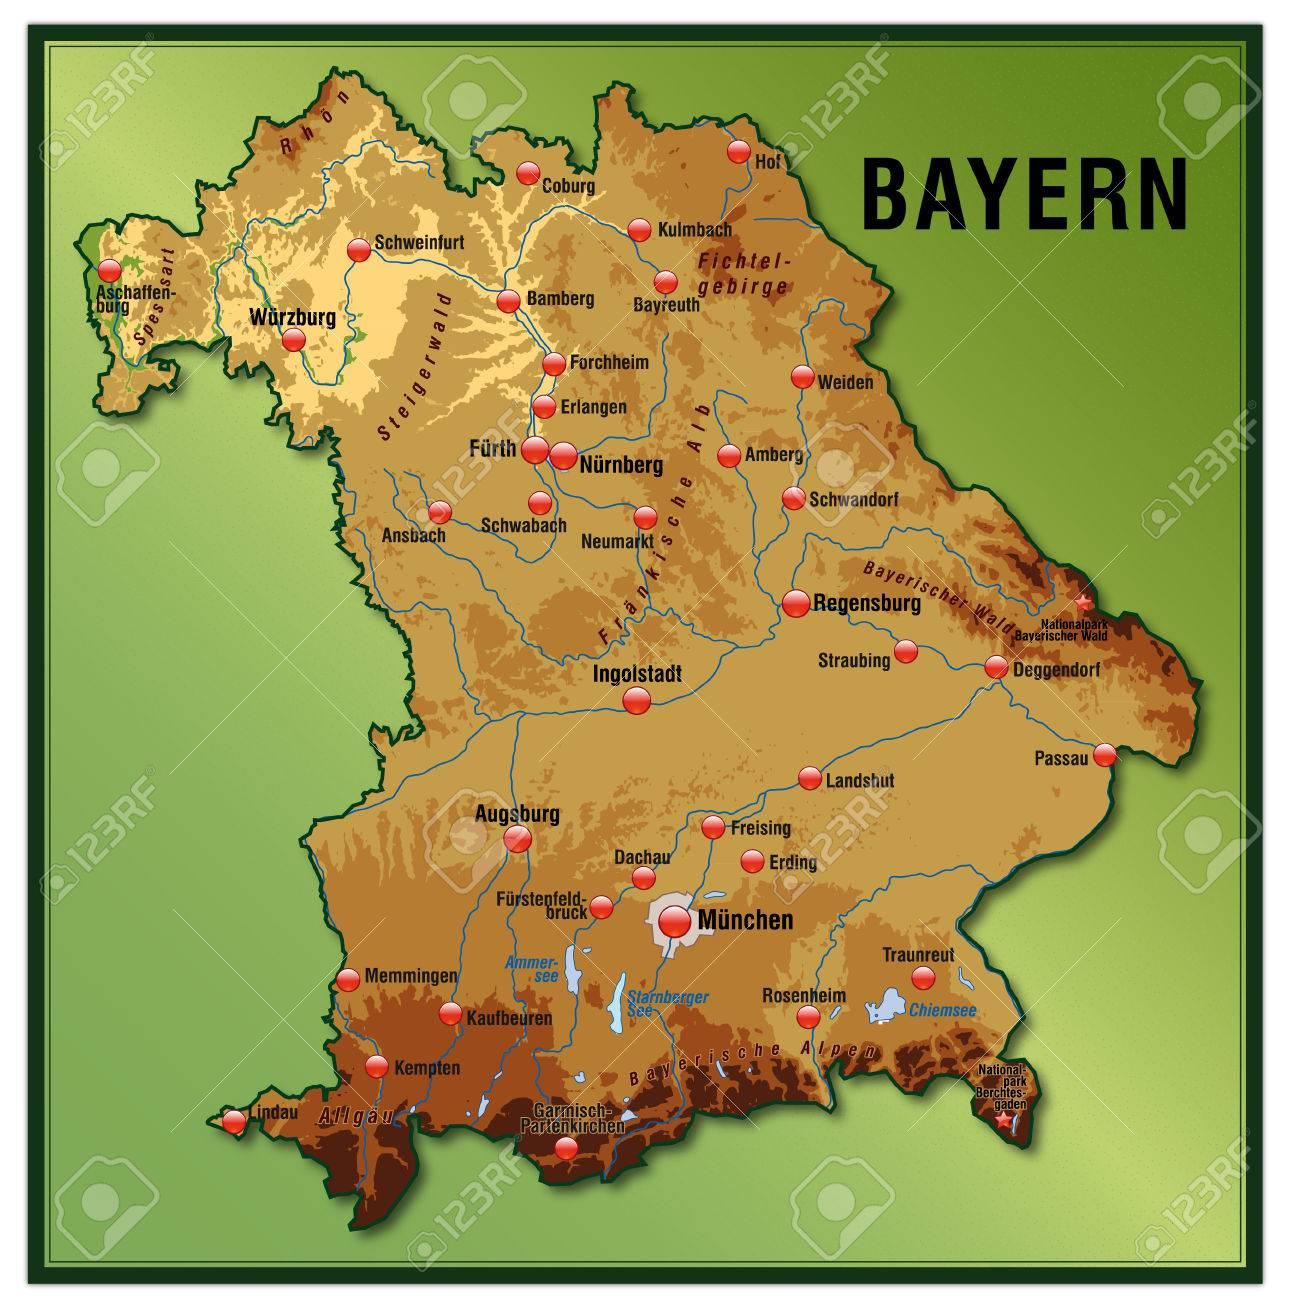 Karte Bayern.Stock Photo